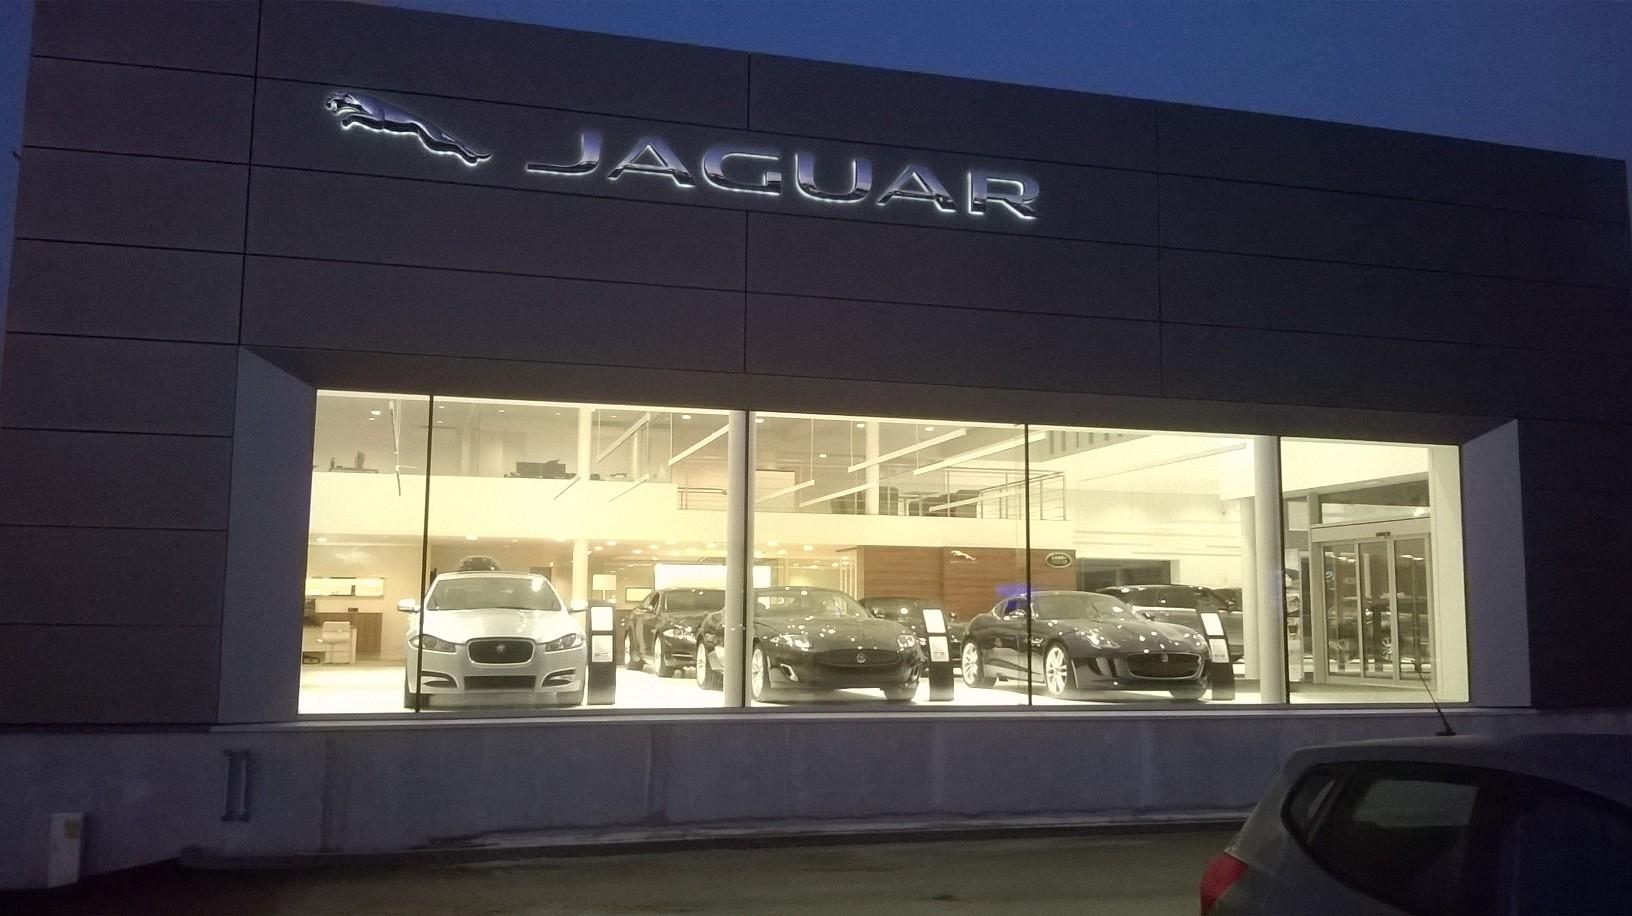 Jaguar - WP_20150107_003.jpg